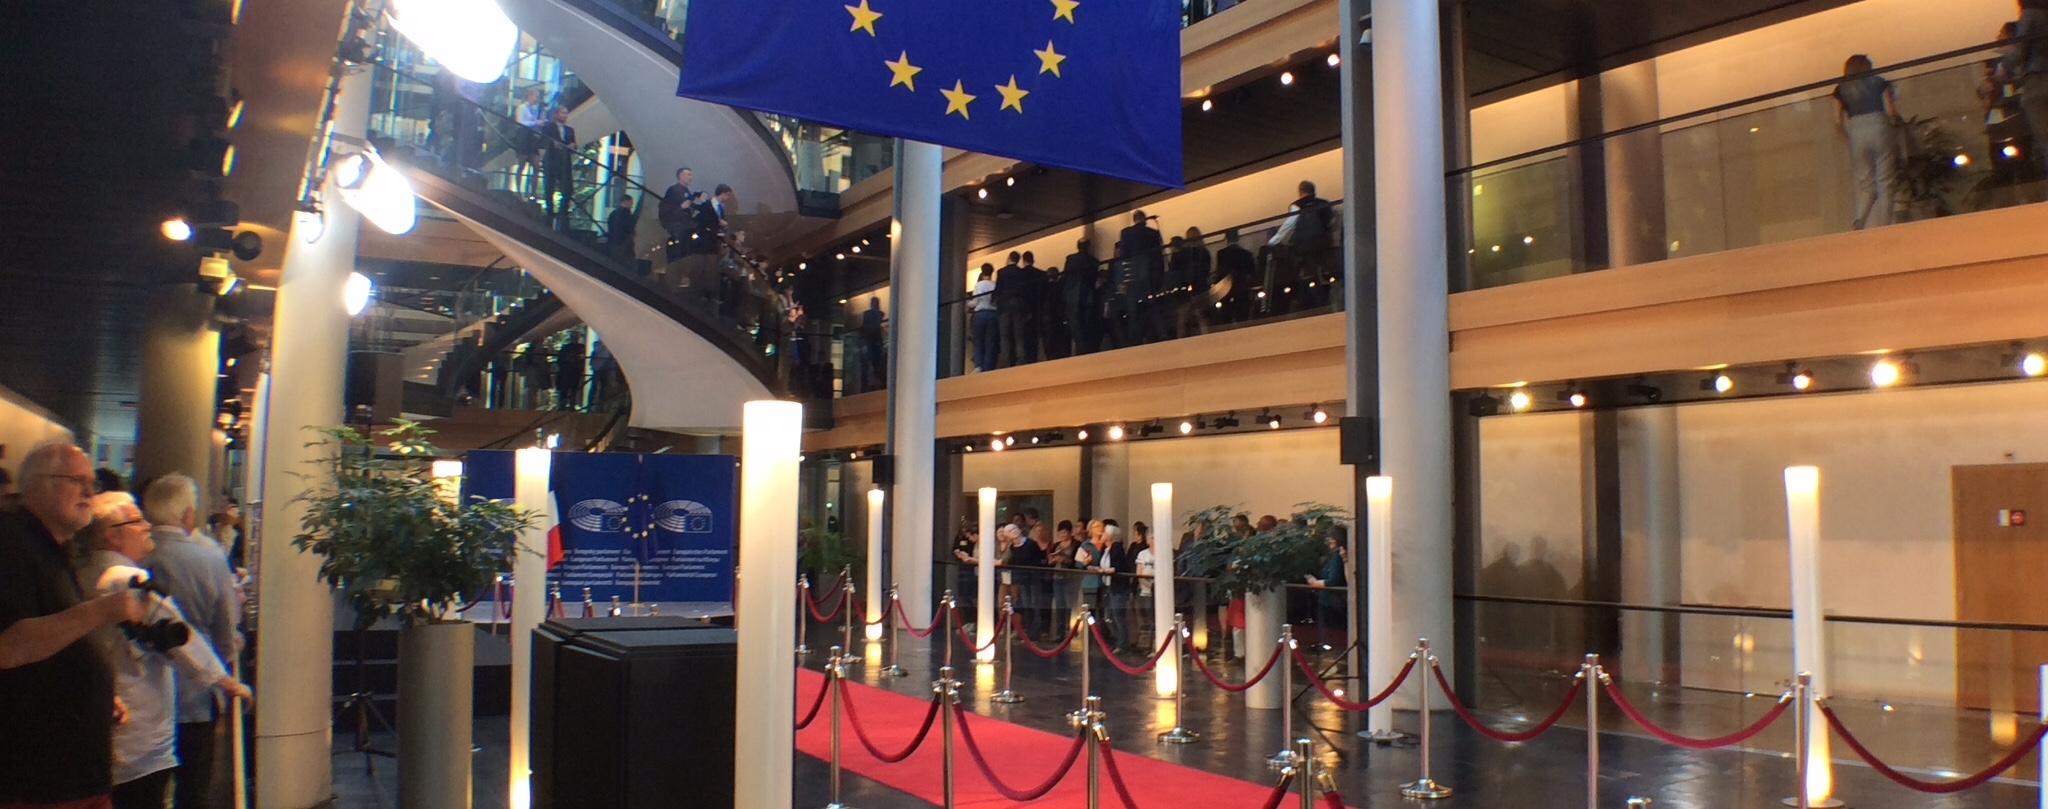 #SOTEU: EU towards European Defence Union